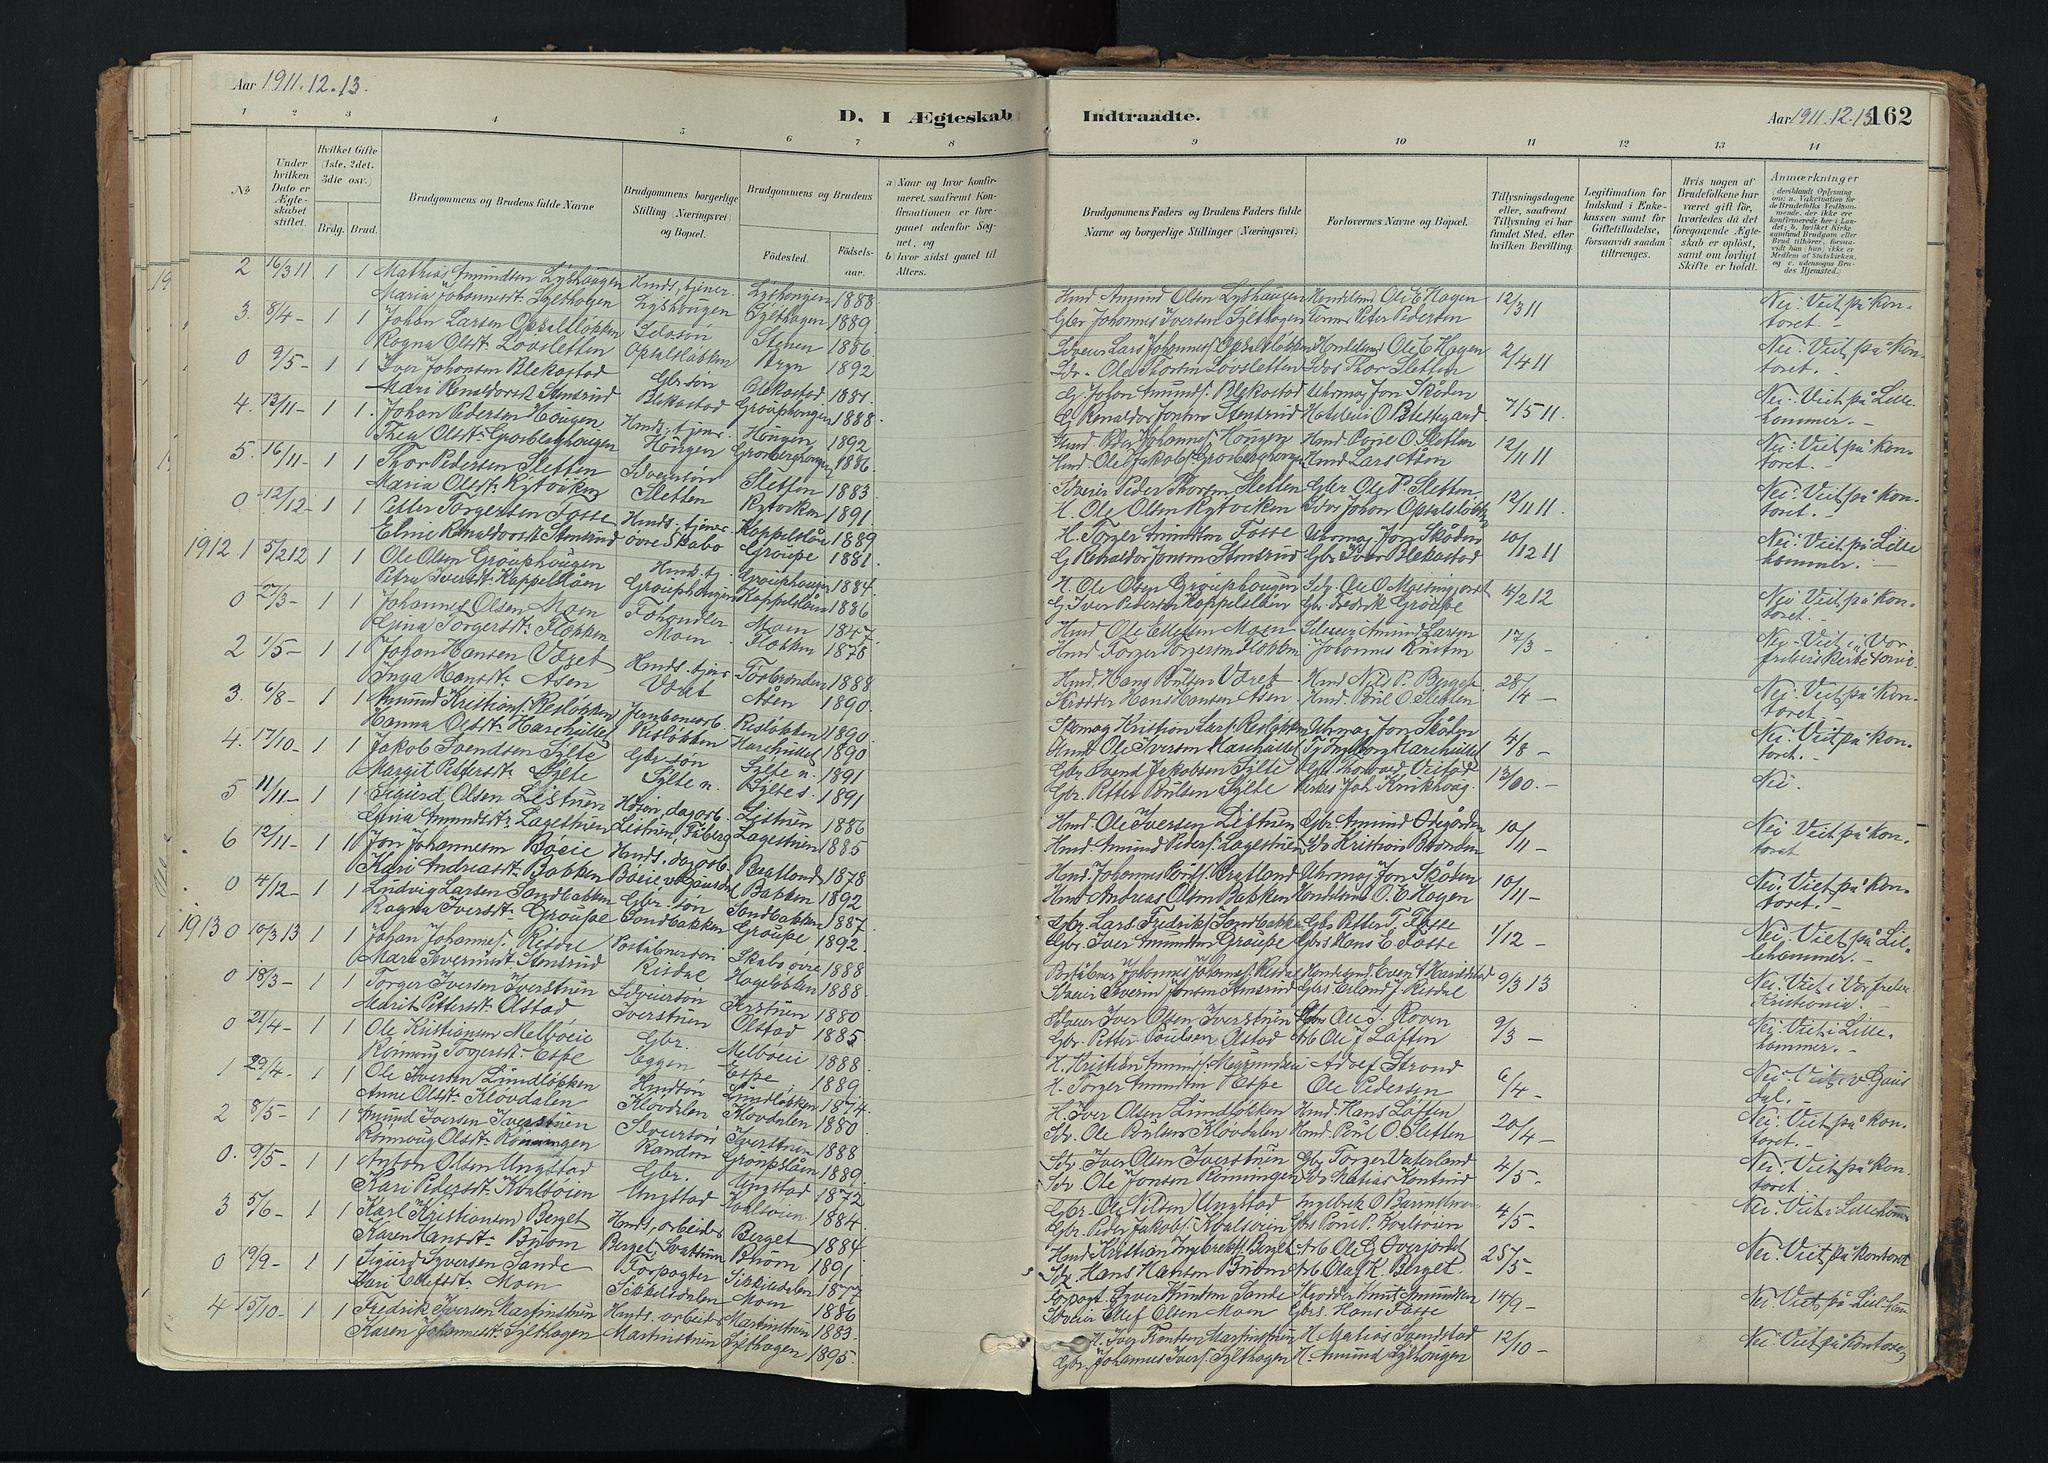 SAH, Nord-Fron prestekontor, Ministerialbok nr. 5, 1884-1914, s. 162